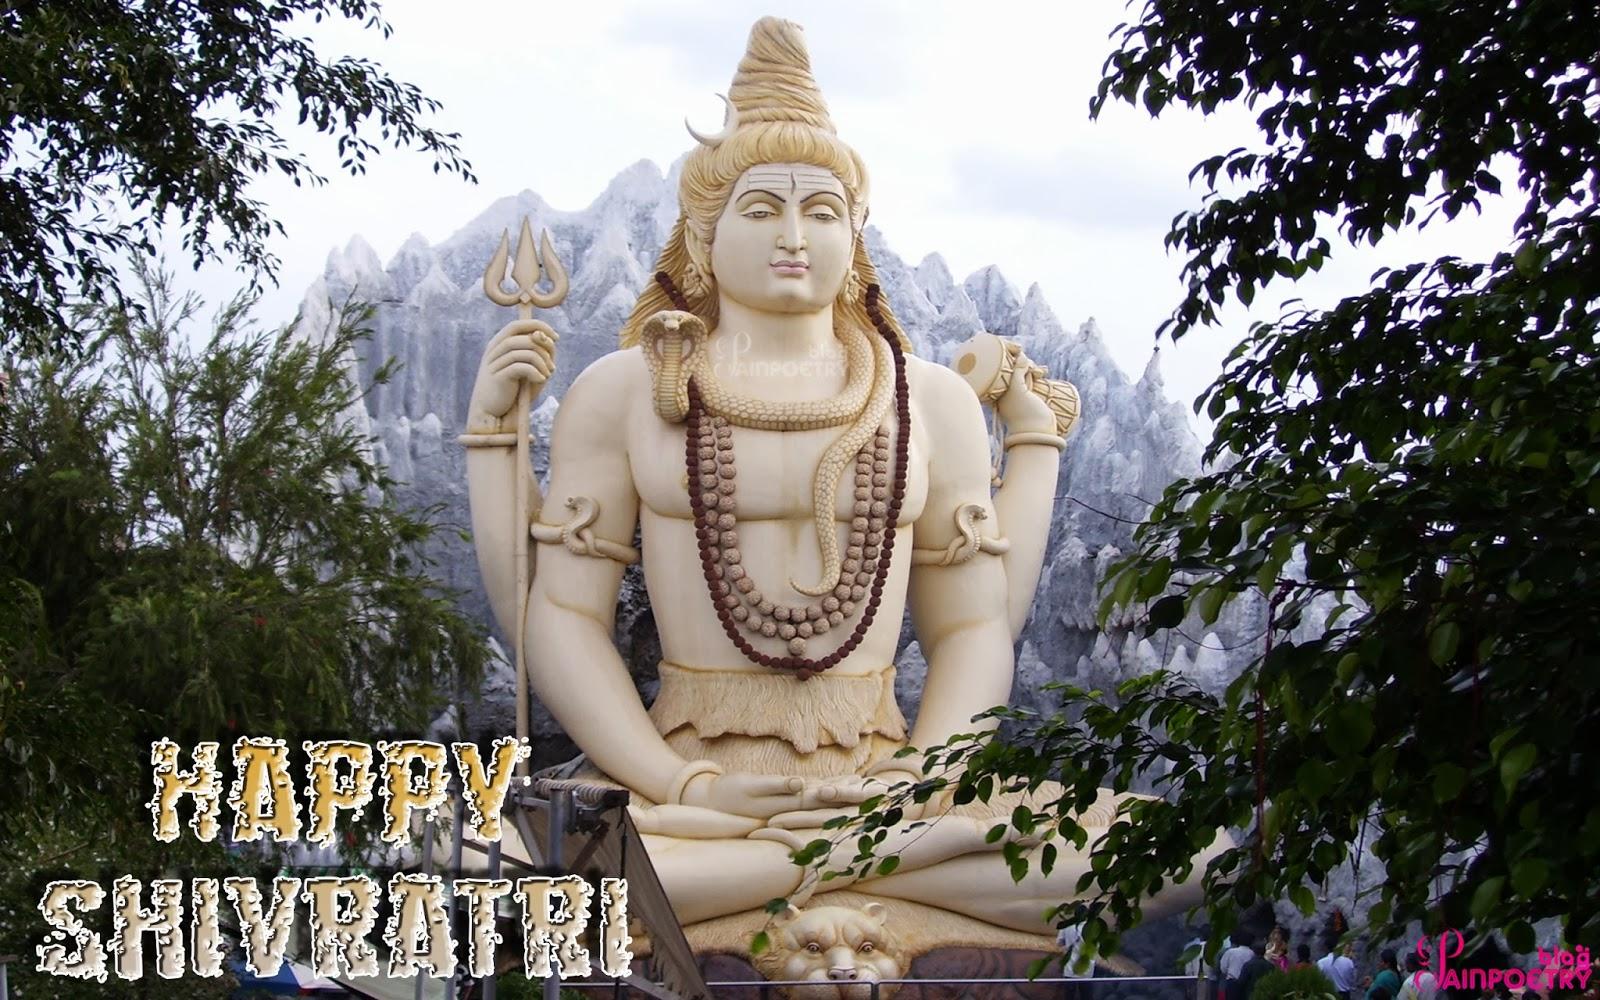 Happy-Shivratri-Wishes-Wallpaper-Image-Photo-Wallpaper-Wide-HD